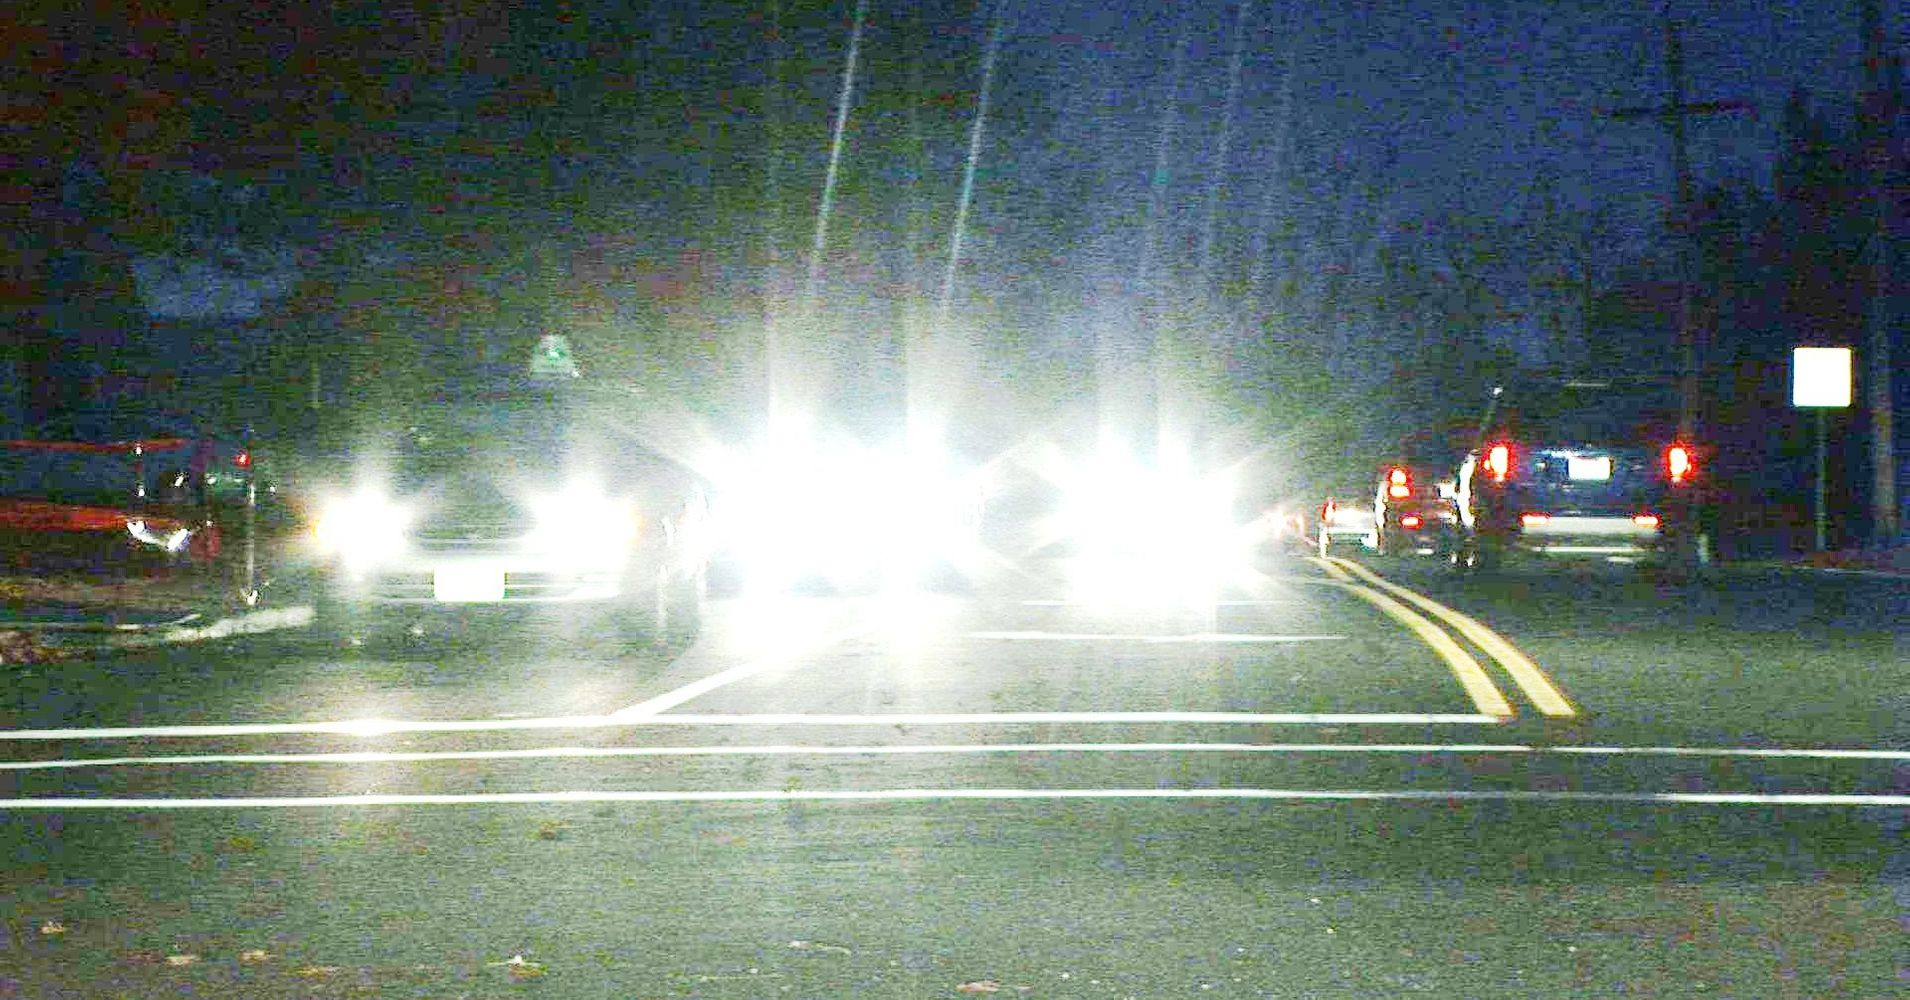 Ban Blinding Headlights Huffpost